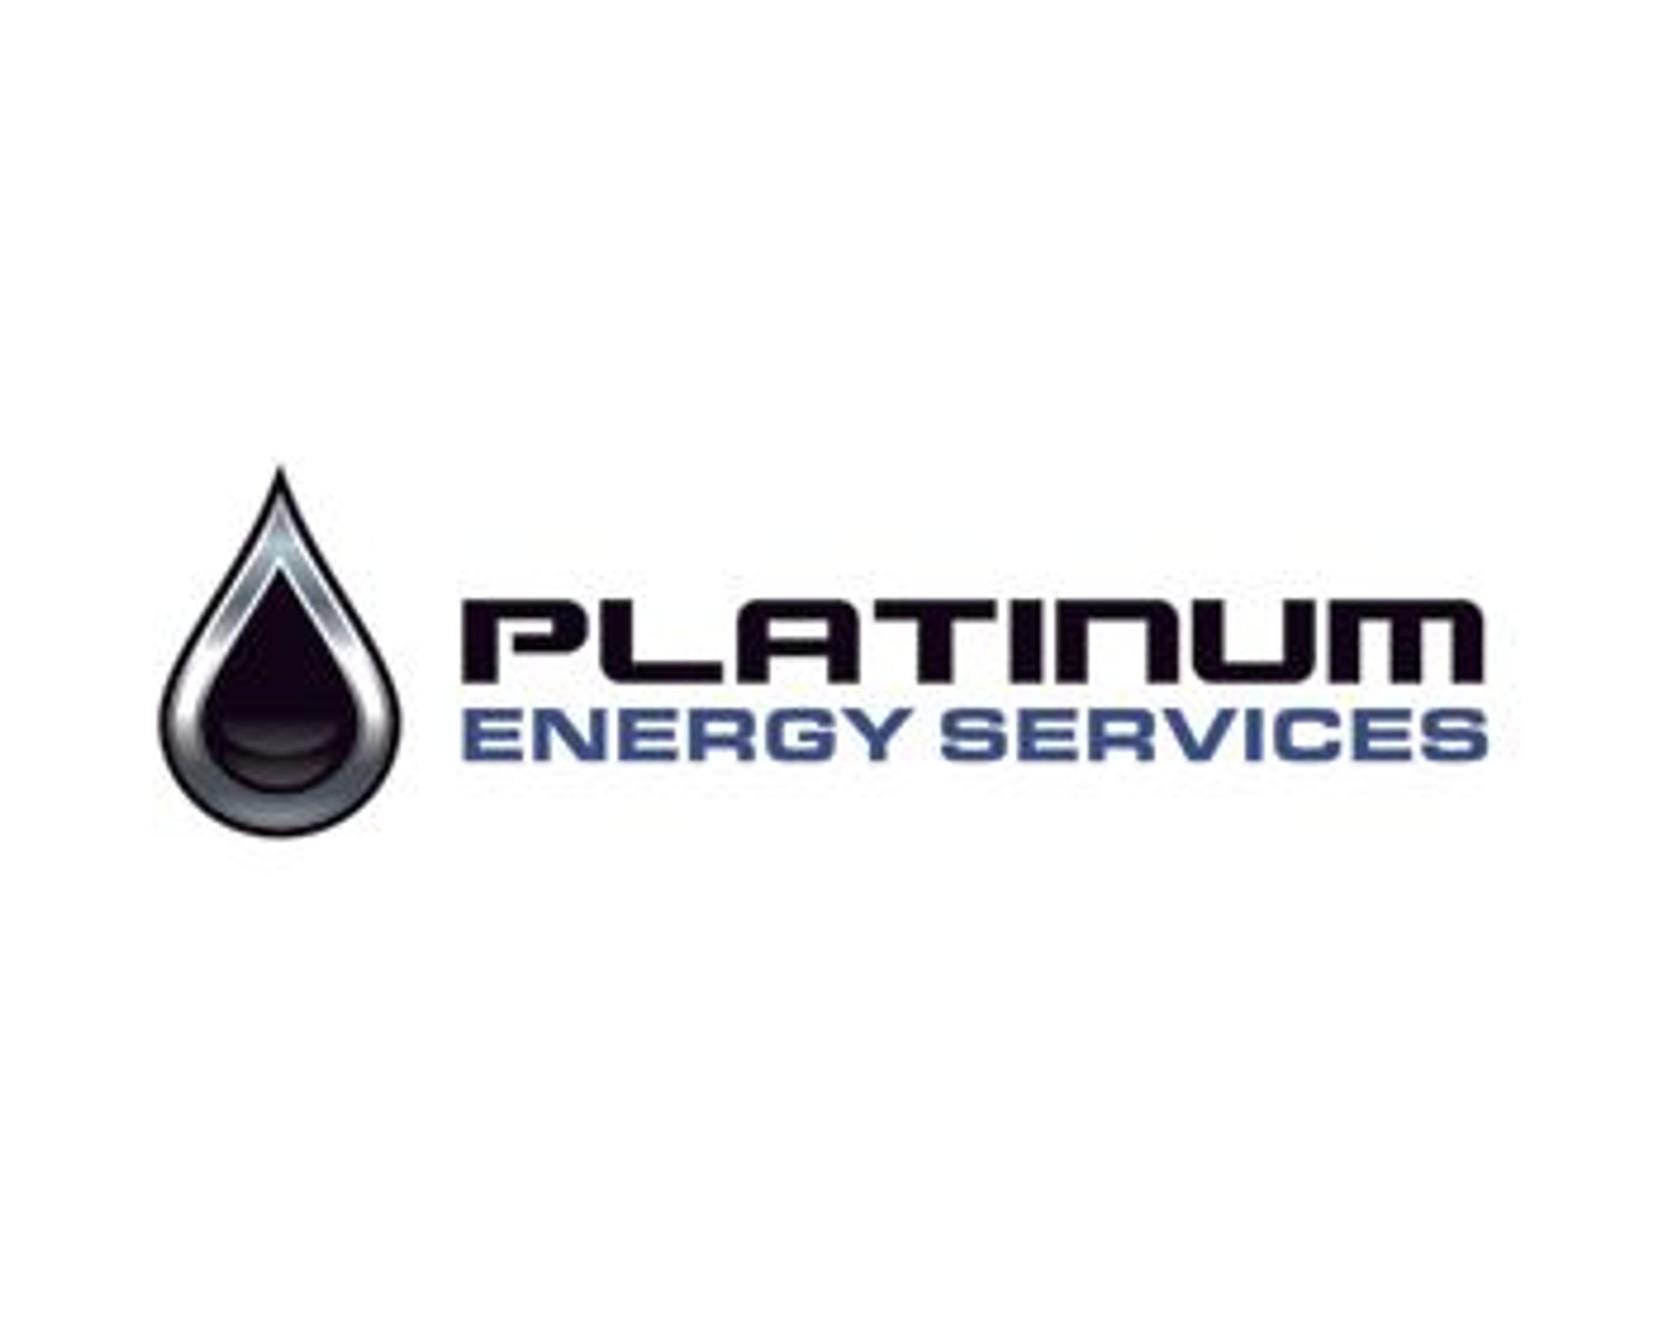 Trinity Platinum Energy Services logo